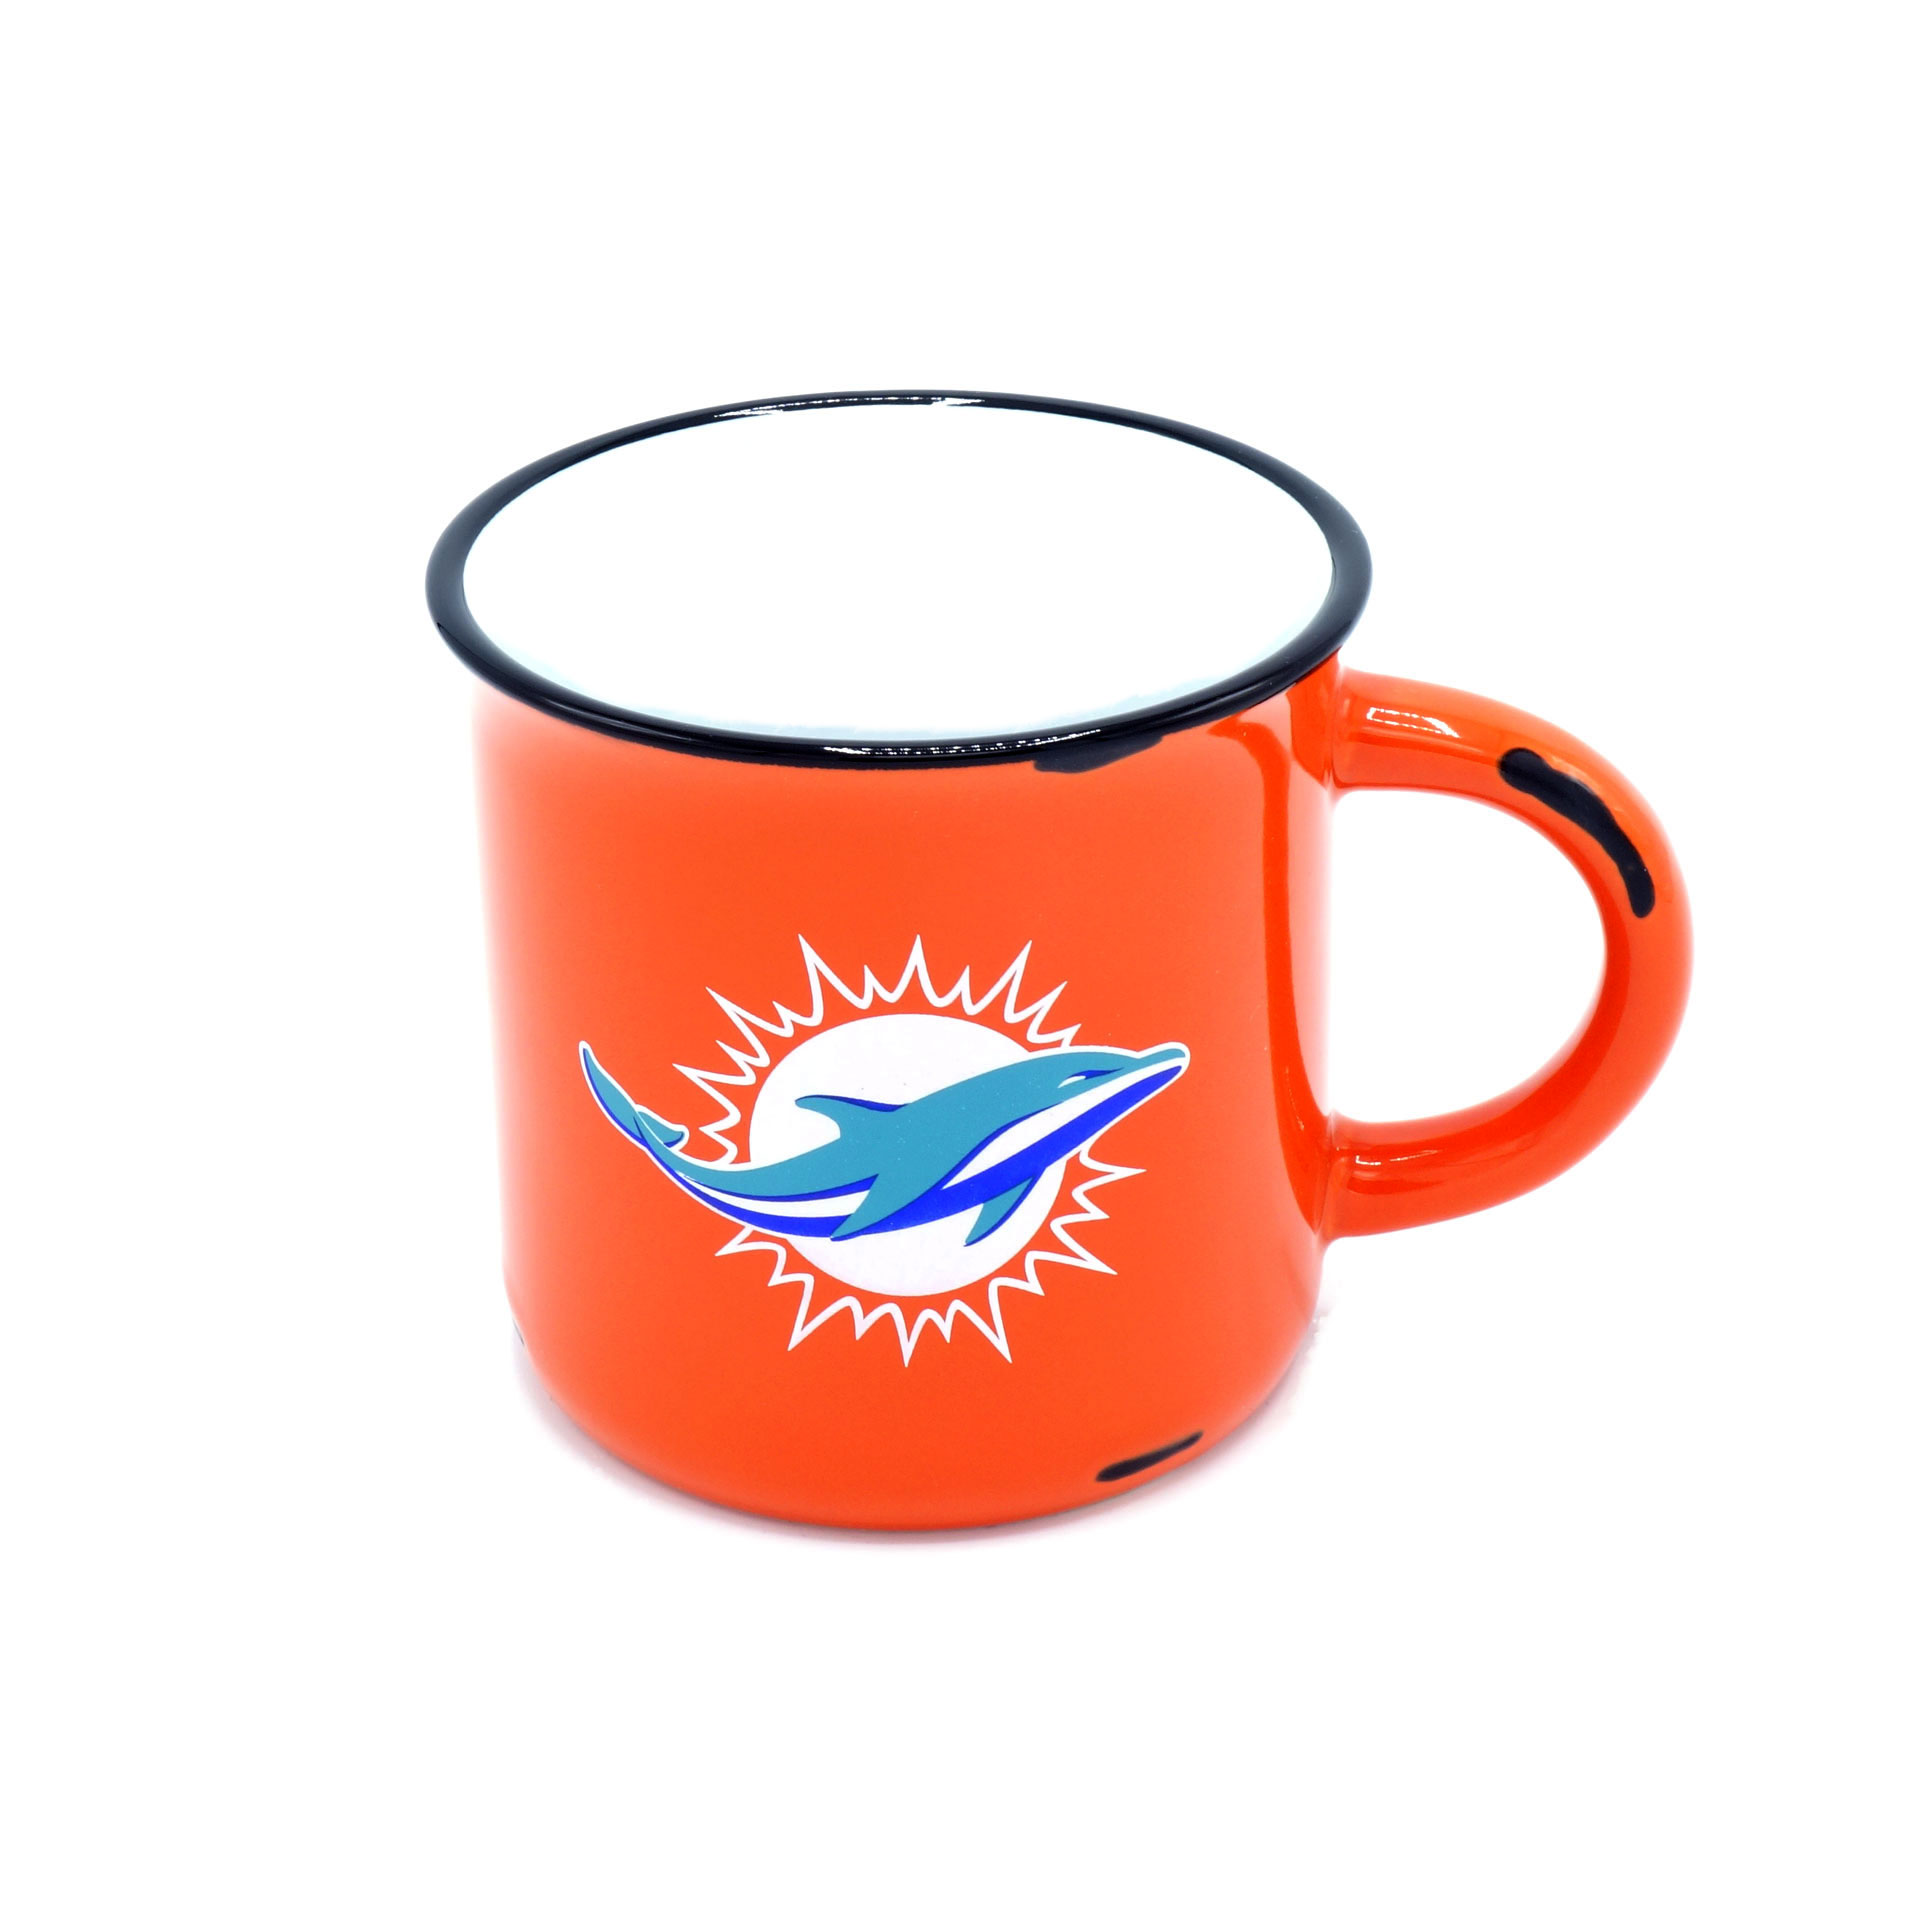 NFL Tasse Miami Dolphins Vintage Emaille Optik